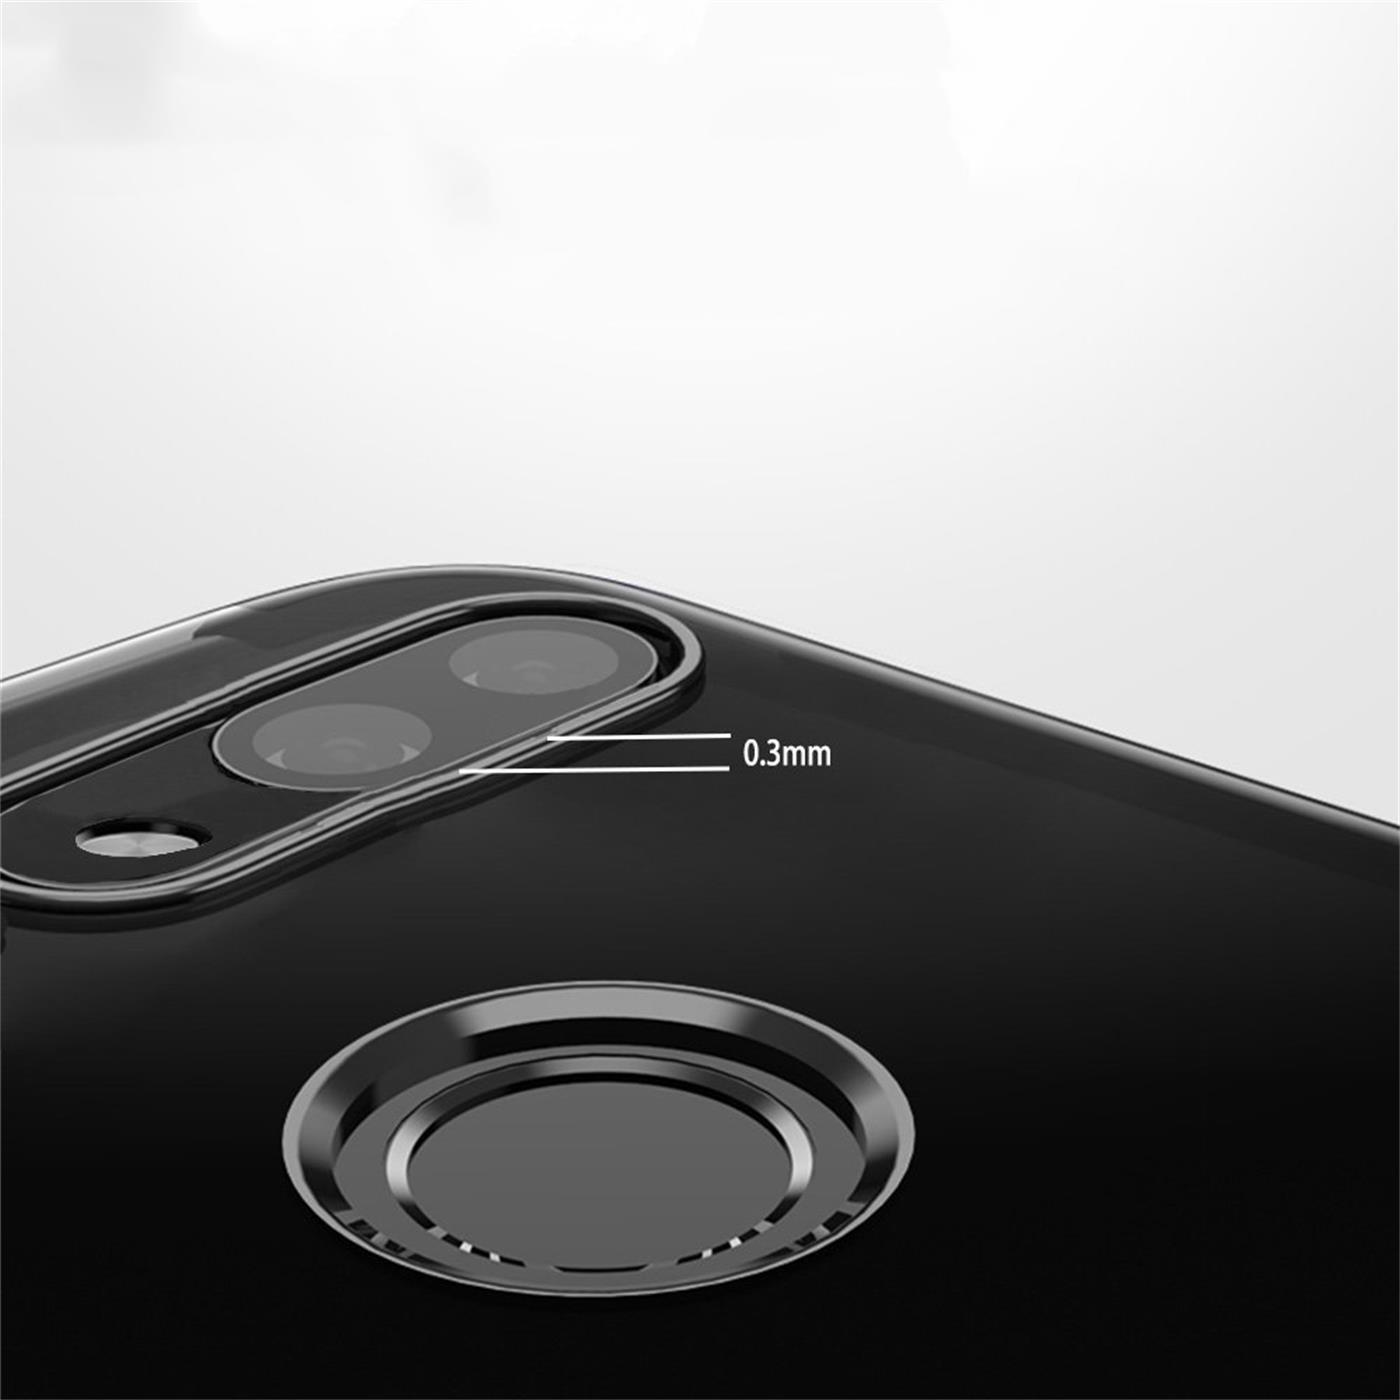 Silikon-Klar-Case-fuer-Huawei-p20-Lite-Ultra-Slim-Stossfeste-Gel-Rueckseite Indexbild 10